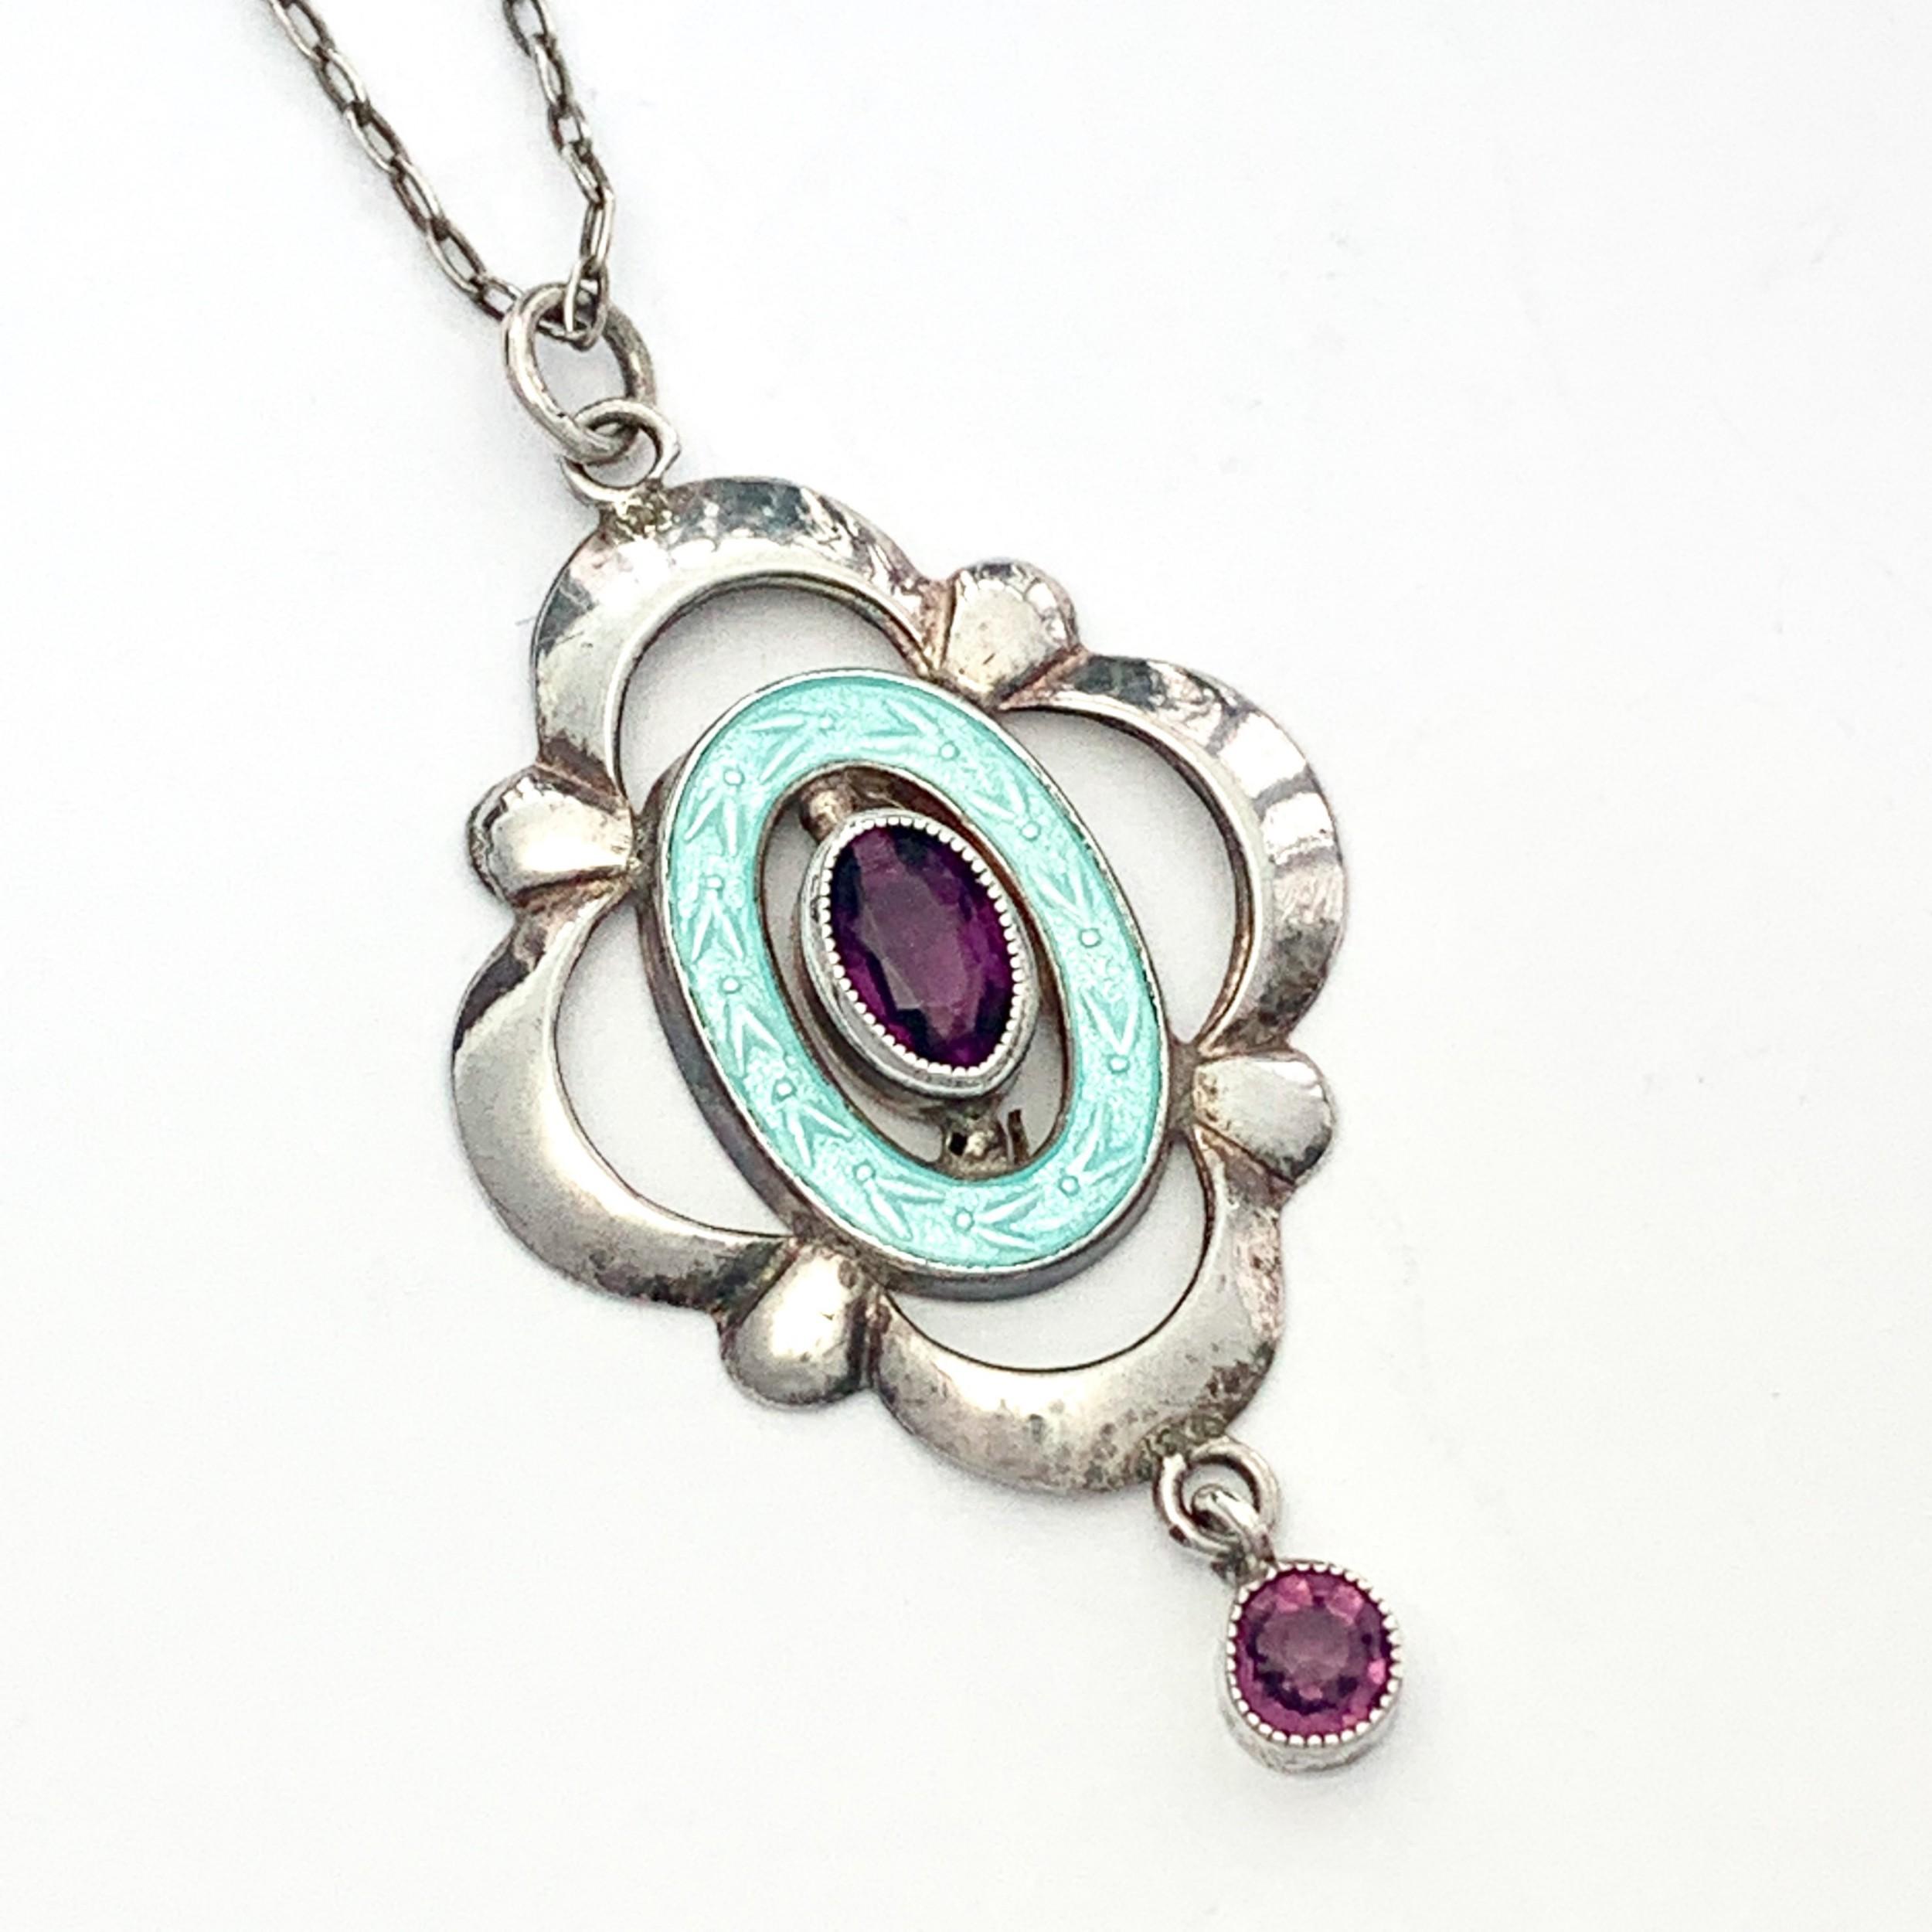 edwardian art nouveau silver guilloche enamel and amethyst necklace